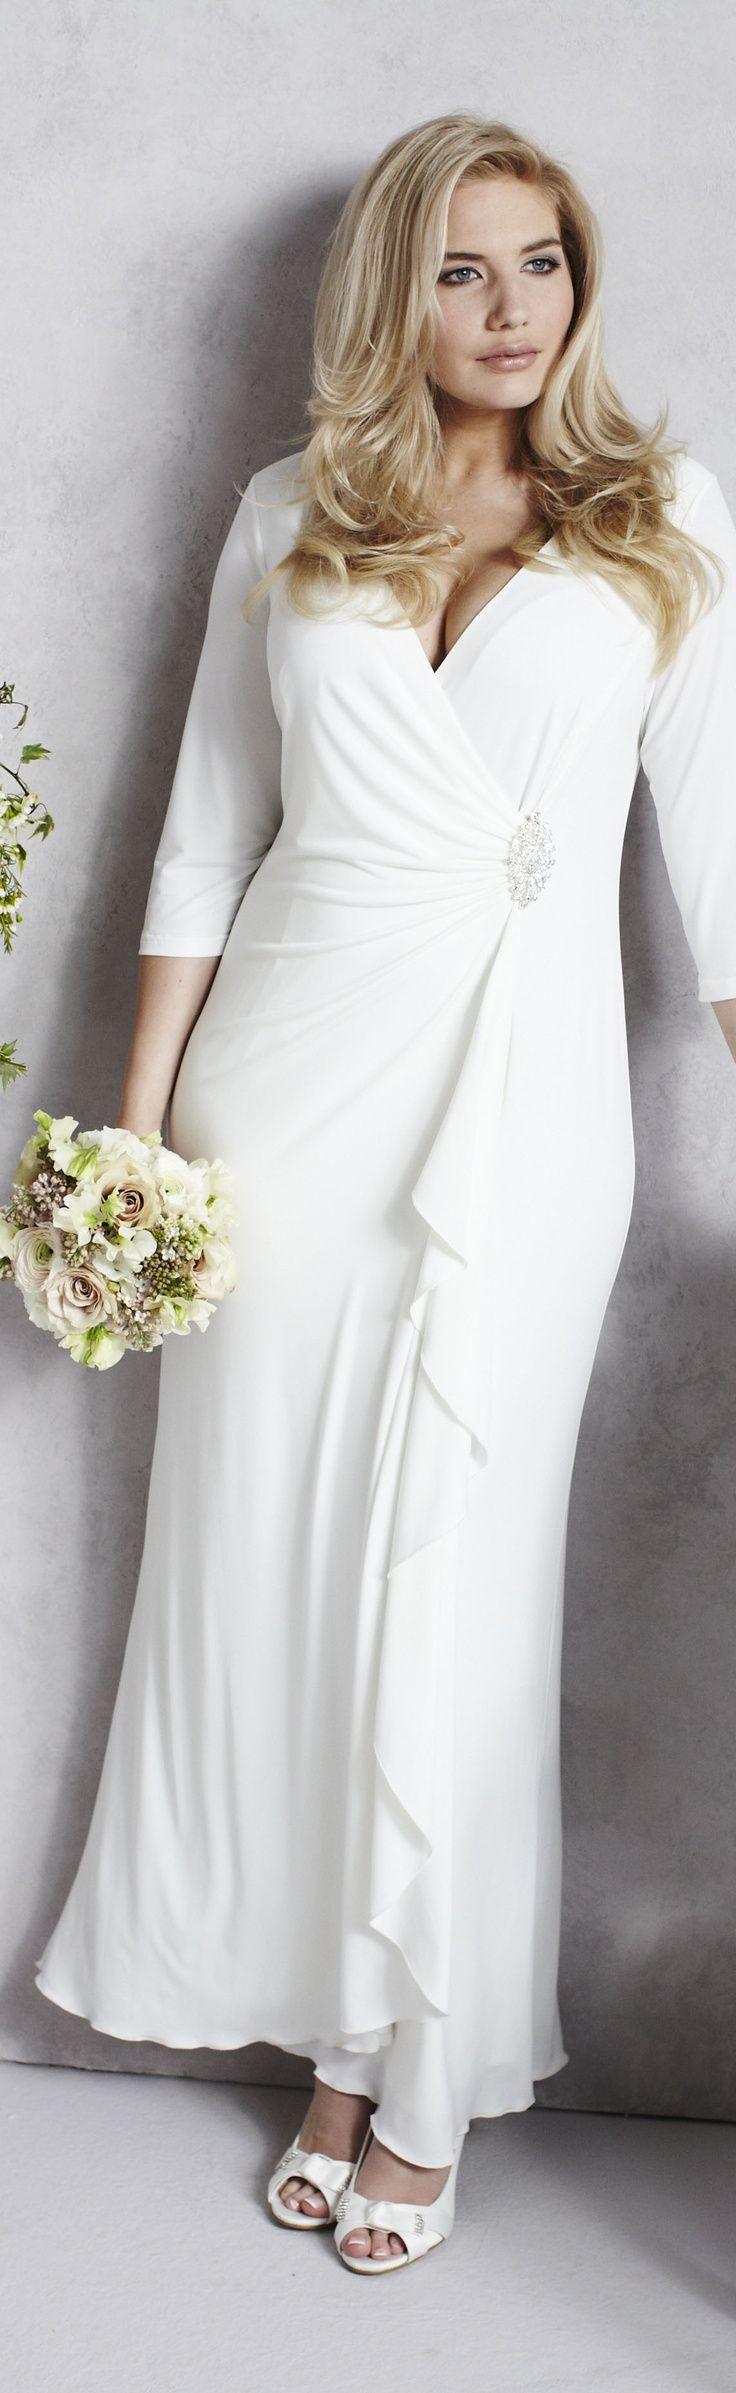 25 best ideas about Mature bride dresses on Pinterest  Mature wedding dresses Older bride and